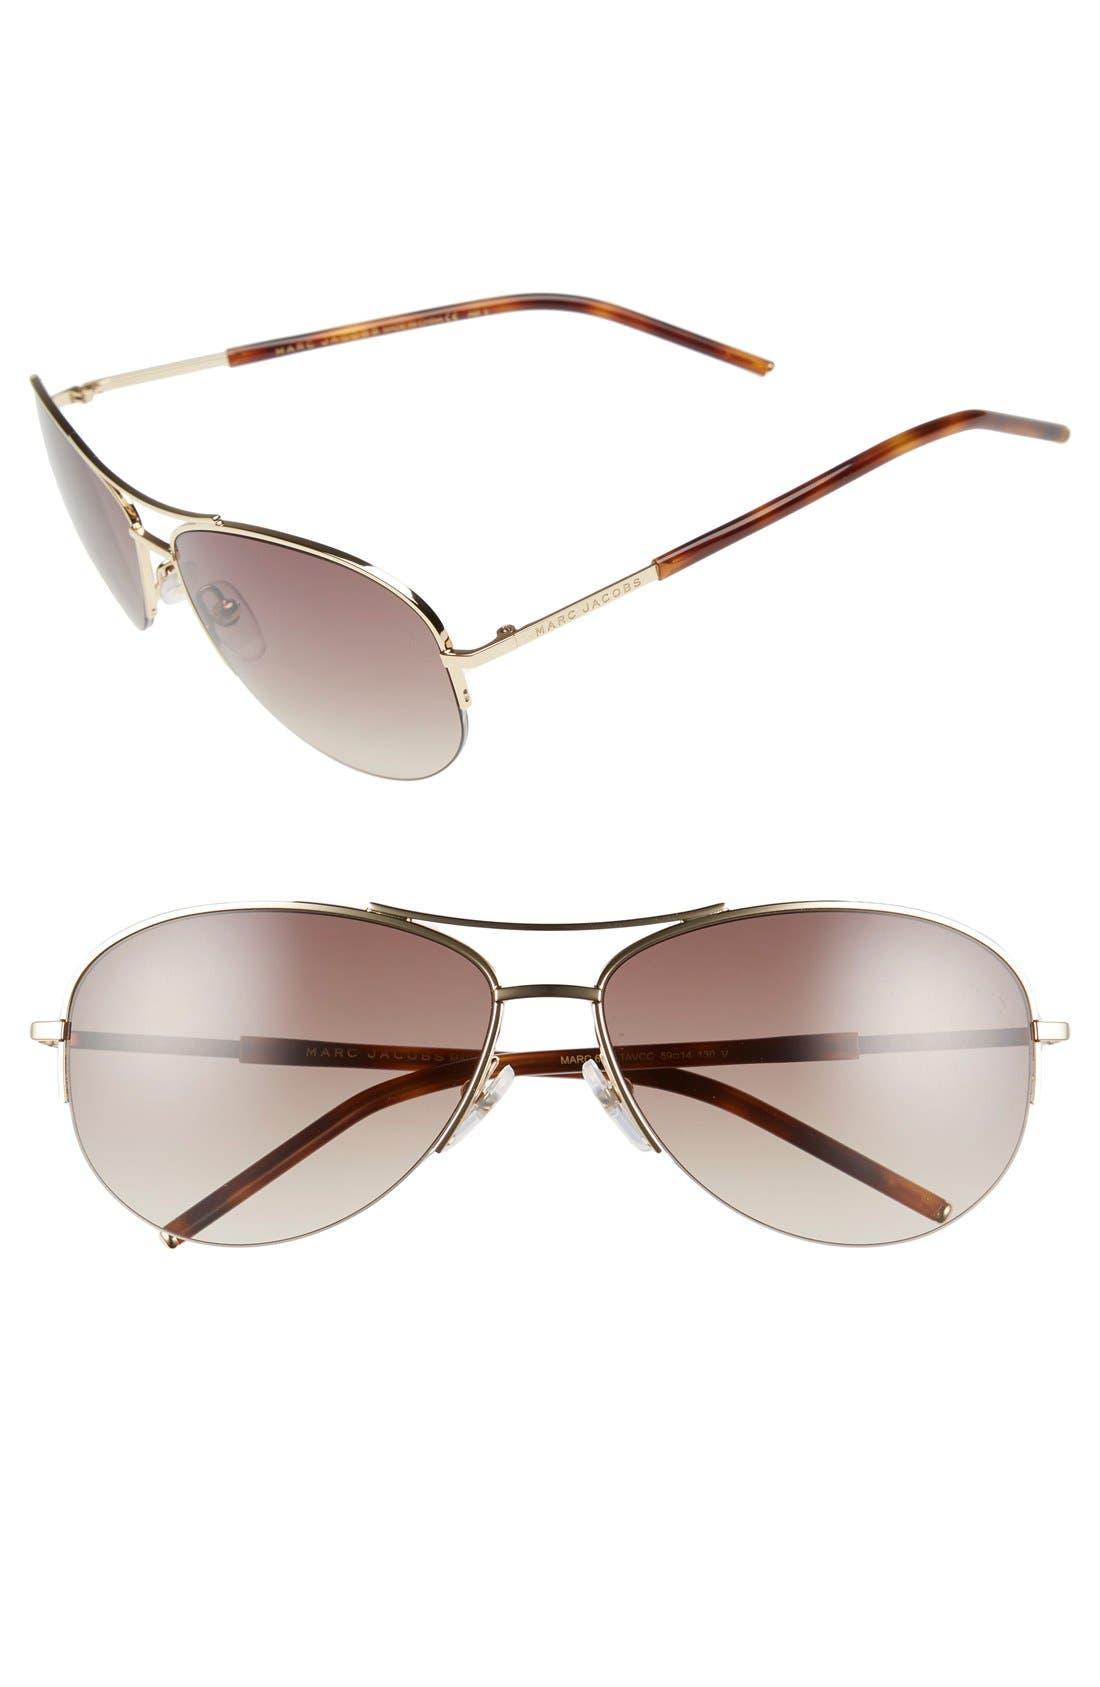 Main Image - MARC JACOBS 59mm Semi Rimless Sunglasses